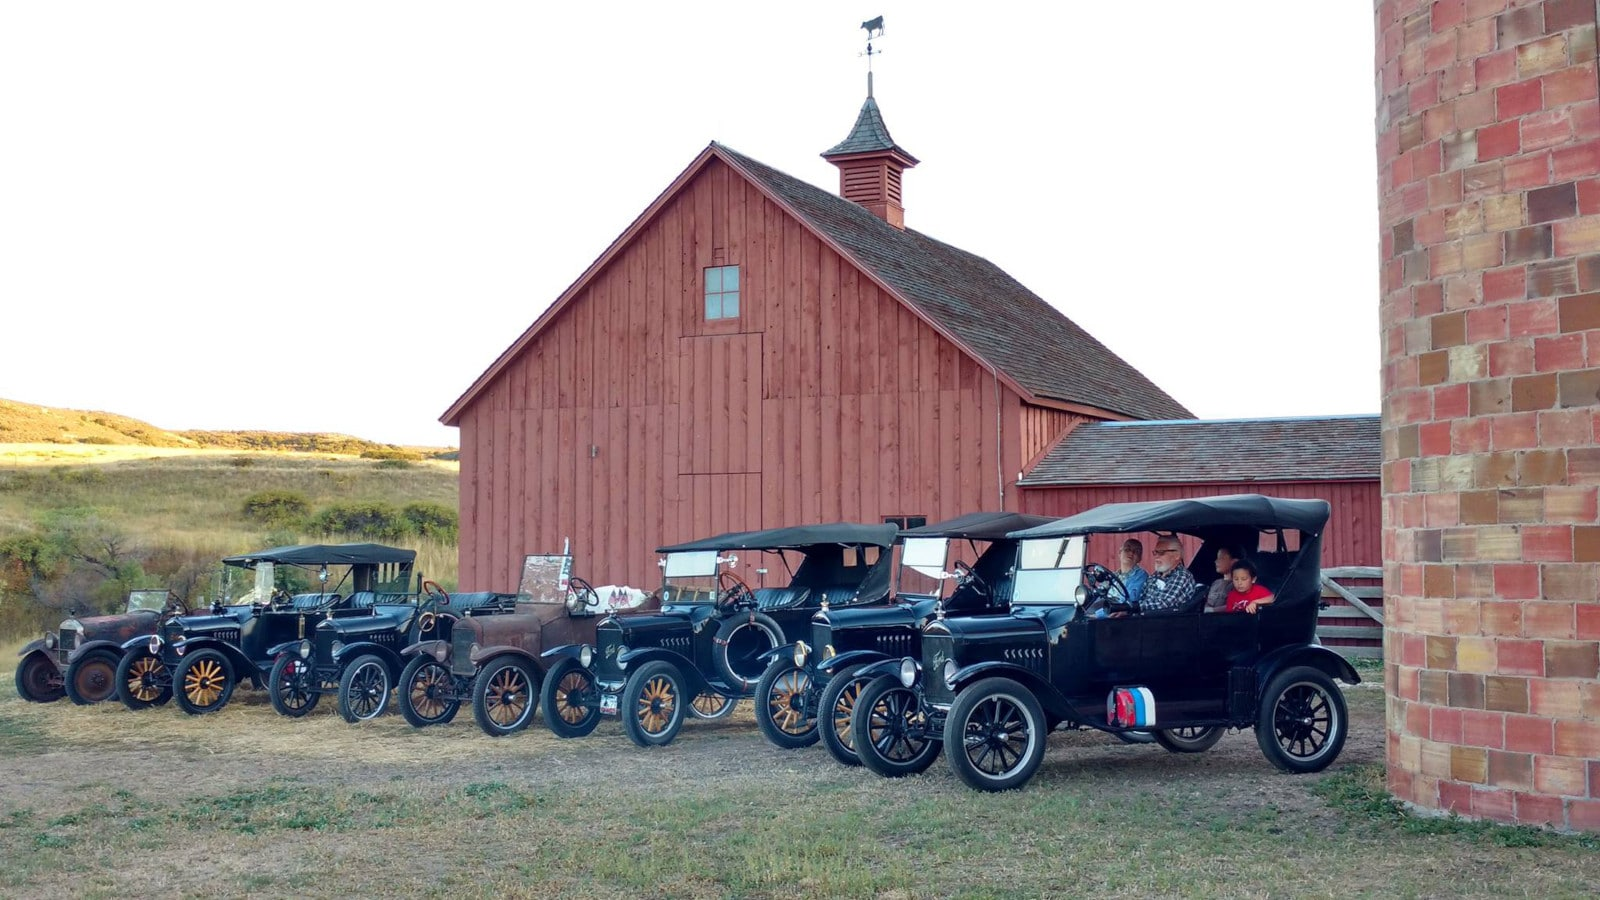 Image of vintage cars at Schweiger Ranch in Lone Tree, Colorado